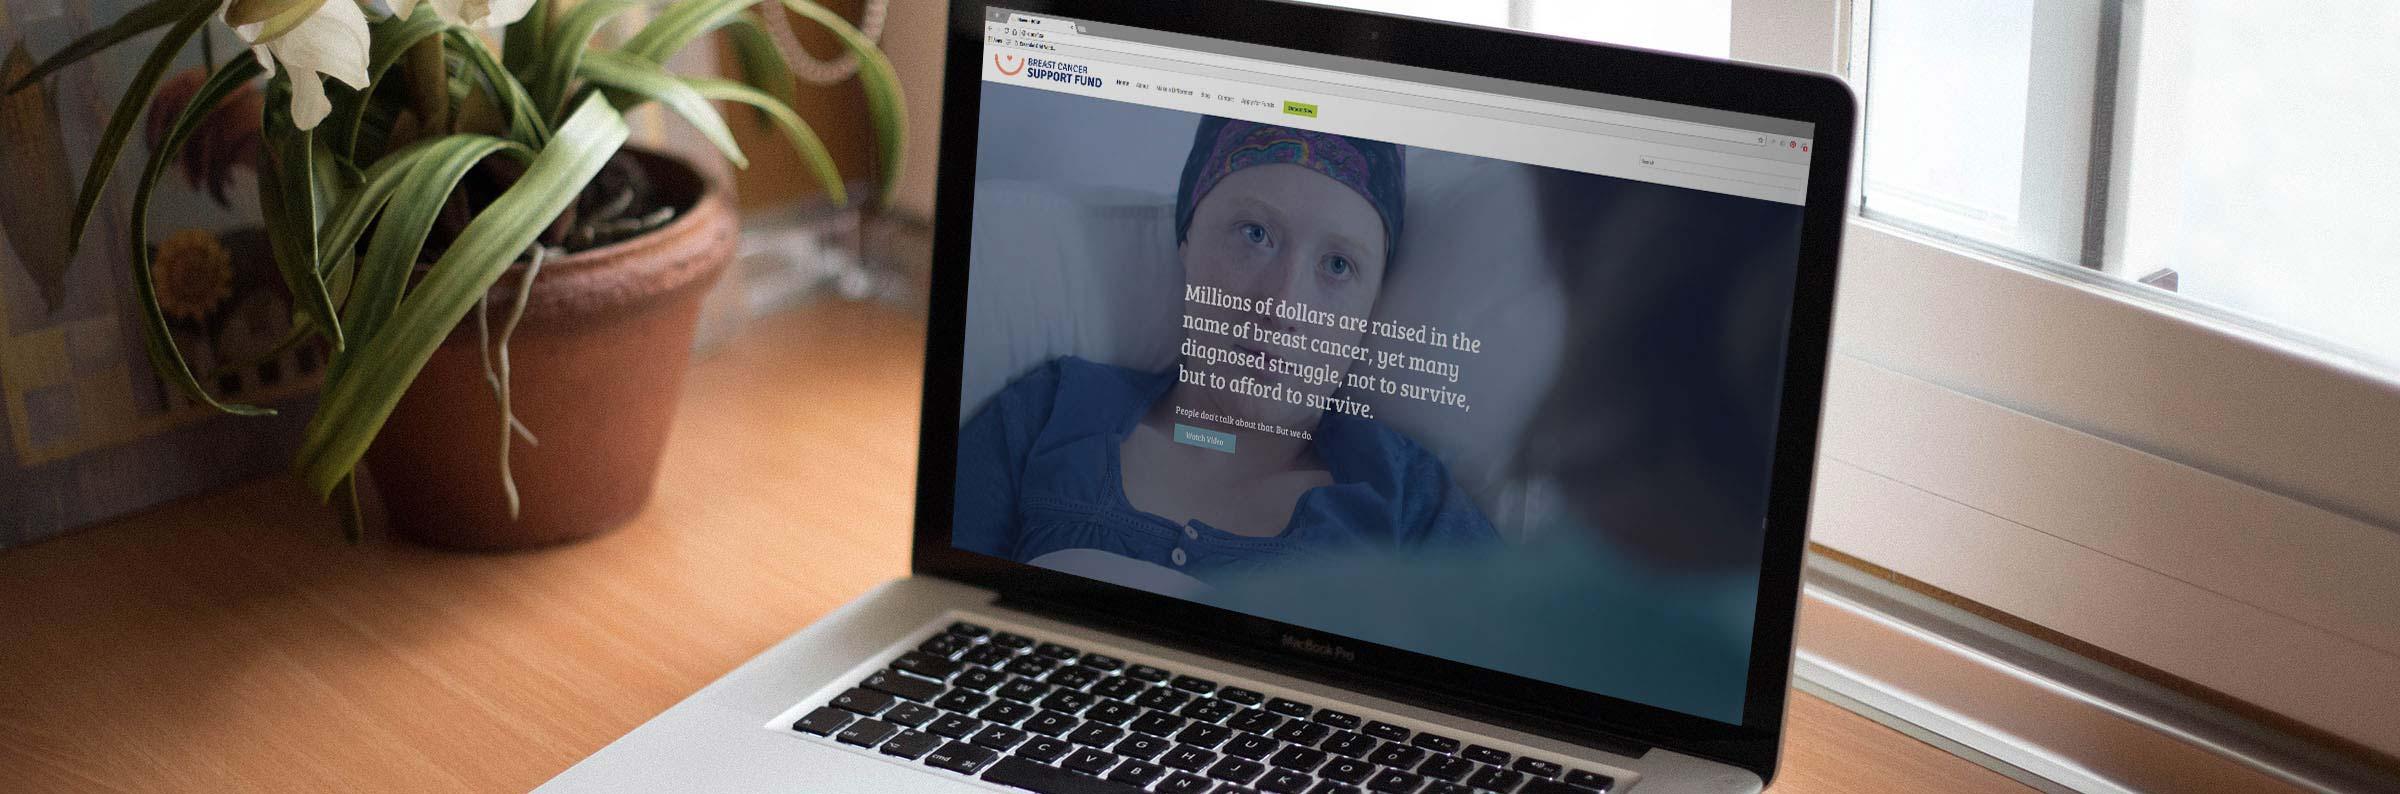 Breast Cancer Support Fund website image